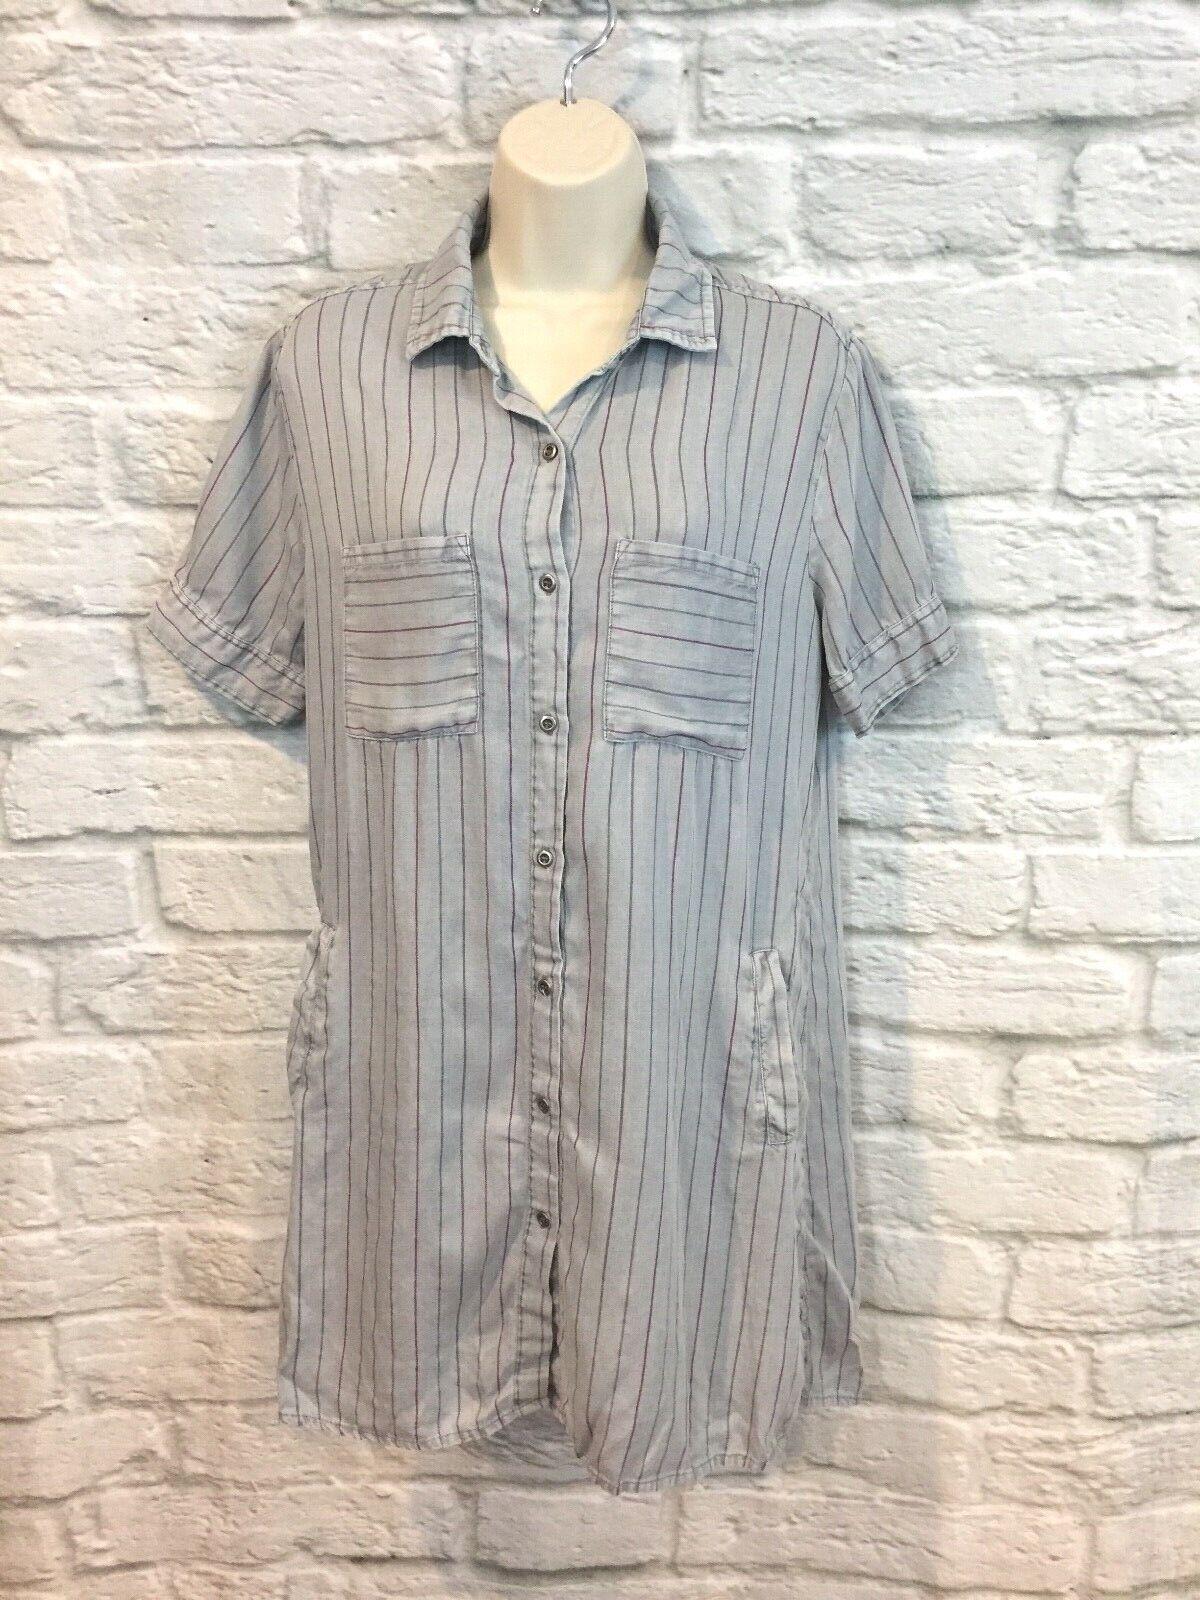 Billy T Women's Gray Striped Chambray Short Sleeve Pockets Shirt Dress Sz Small